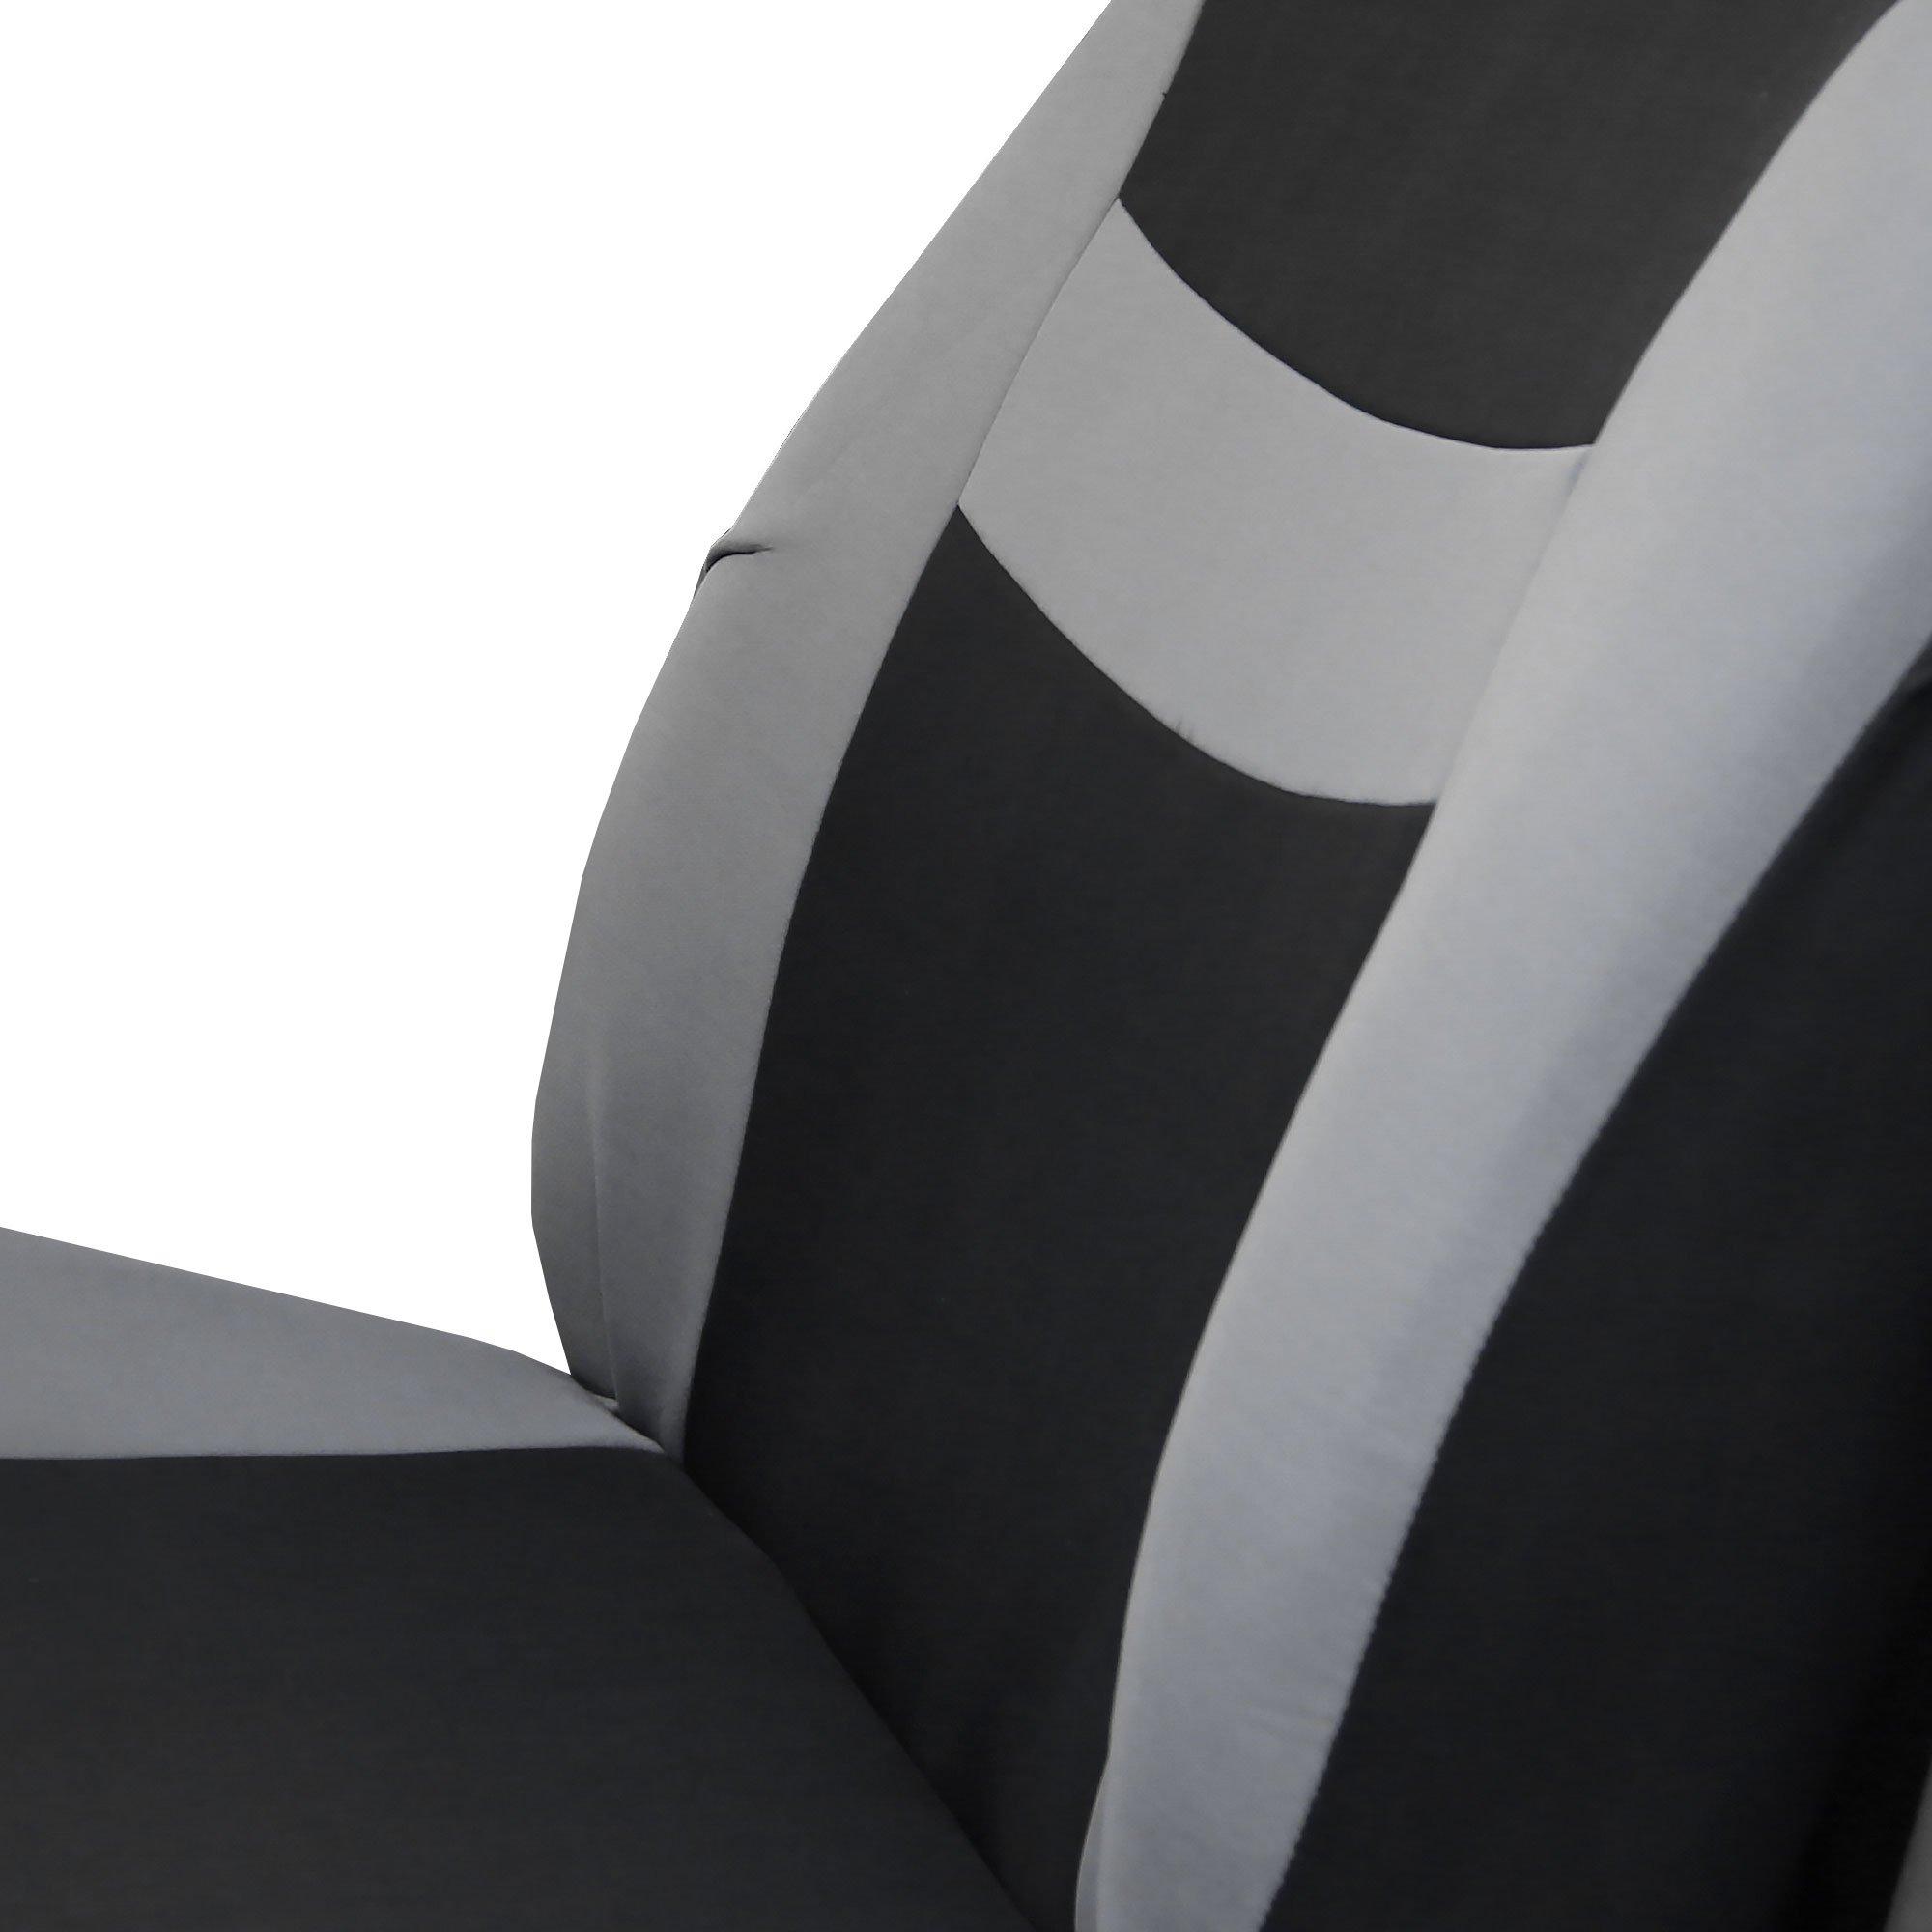 Genuine Hyundai 89200-2E000-WKX Seat Cushion Assembly Rear Right